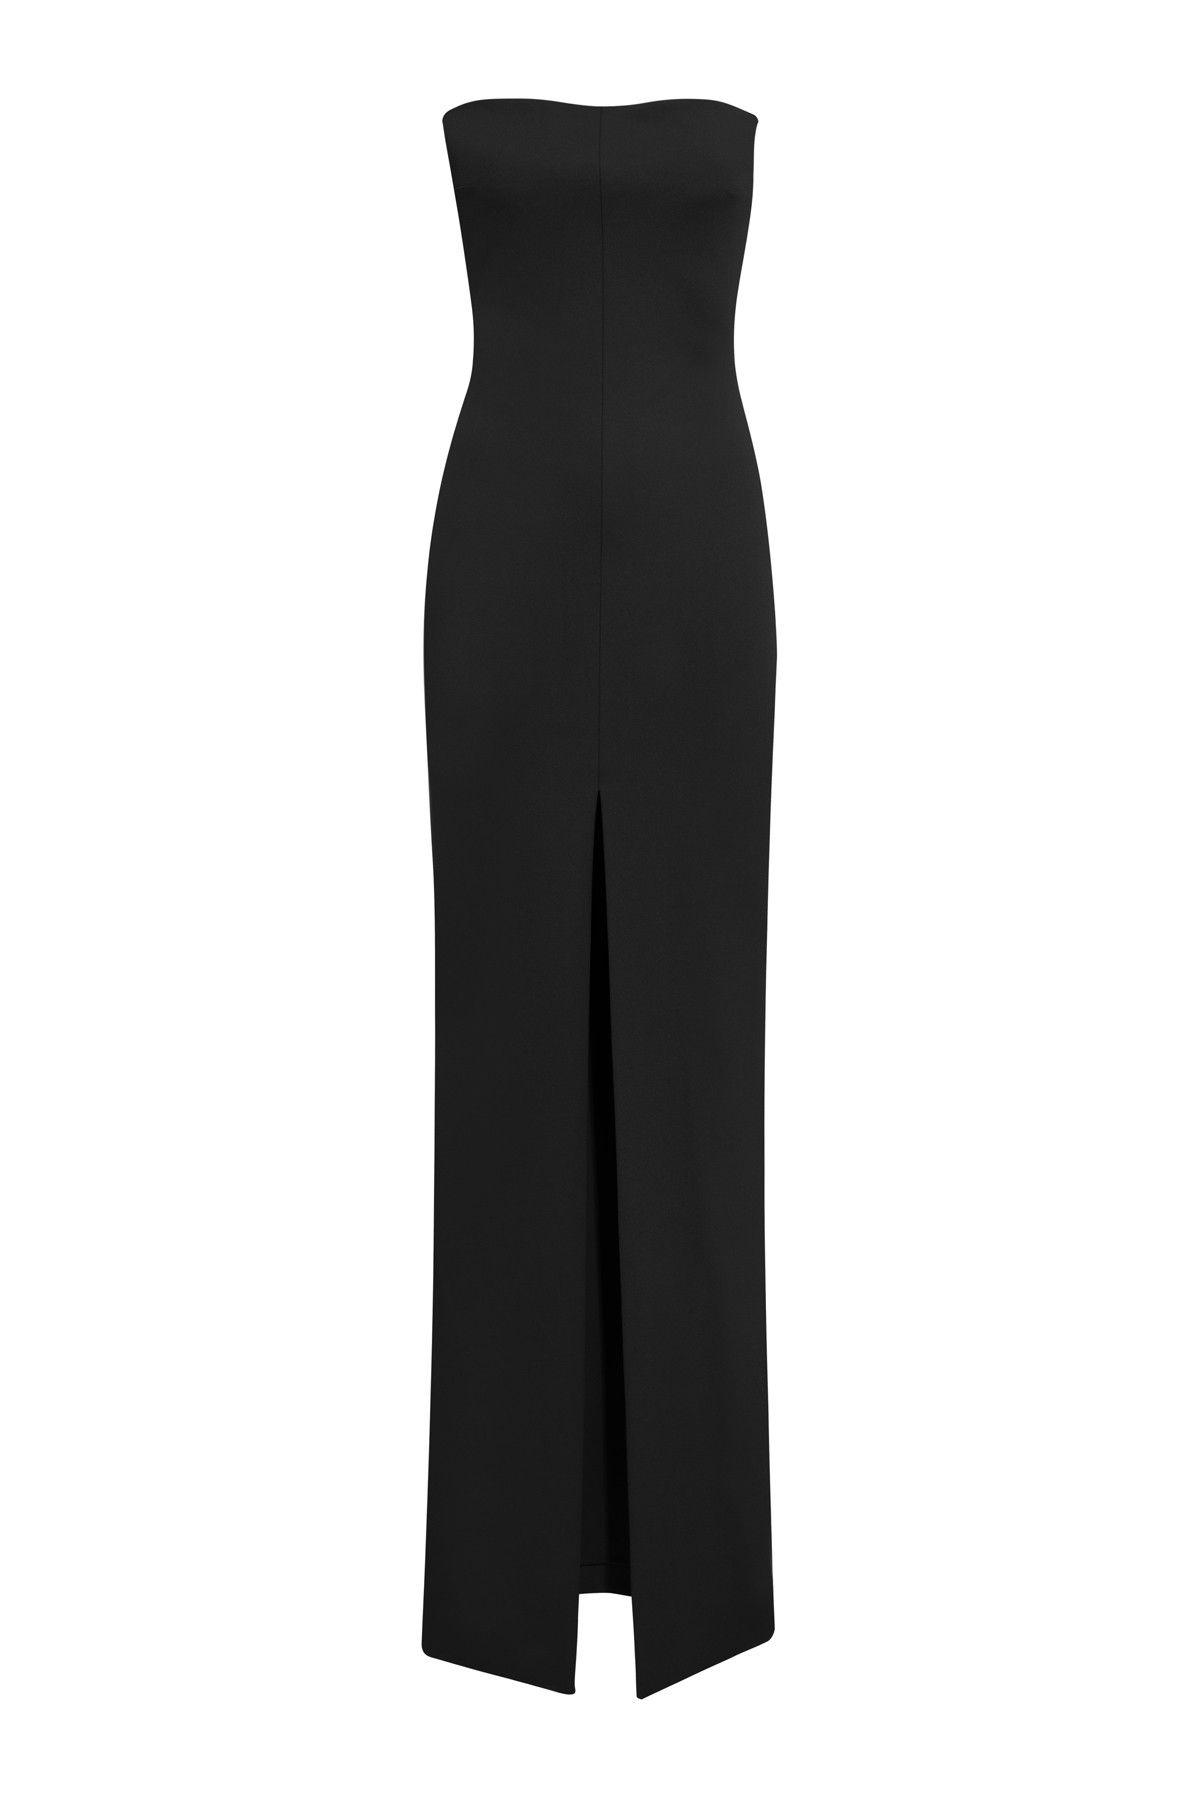 5f384ecd5277 Solace London Bysha Maxi Dress Black   Dress in 2019   Dresses ...